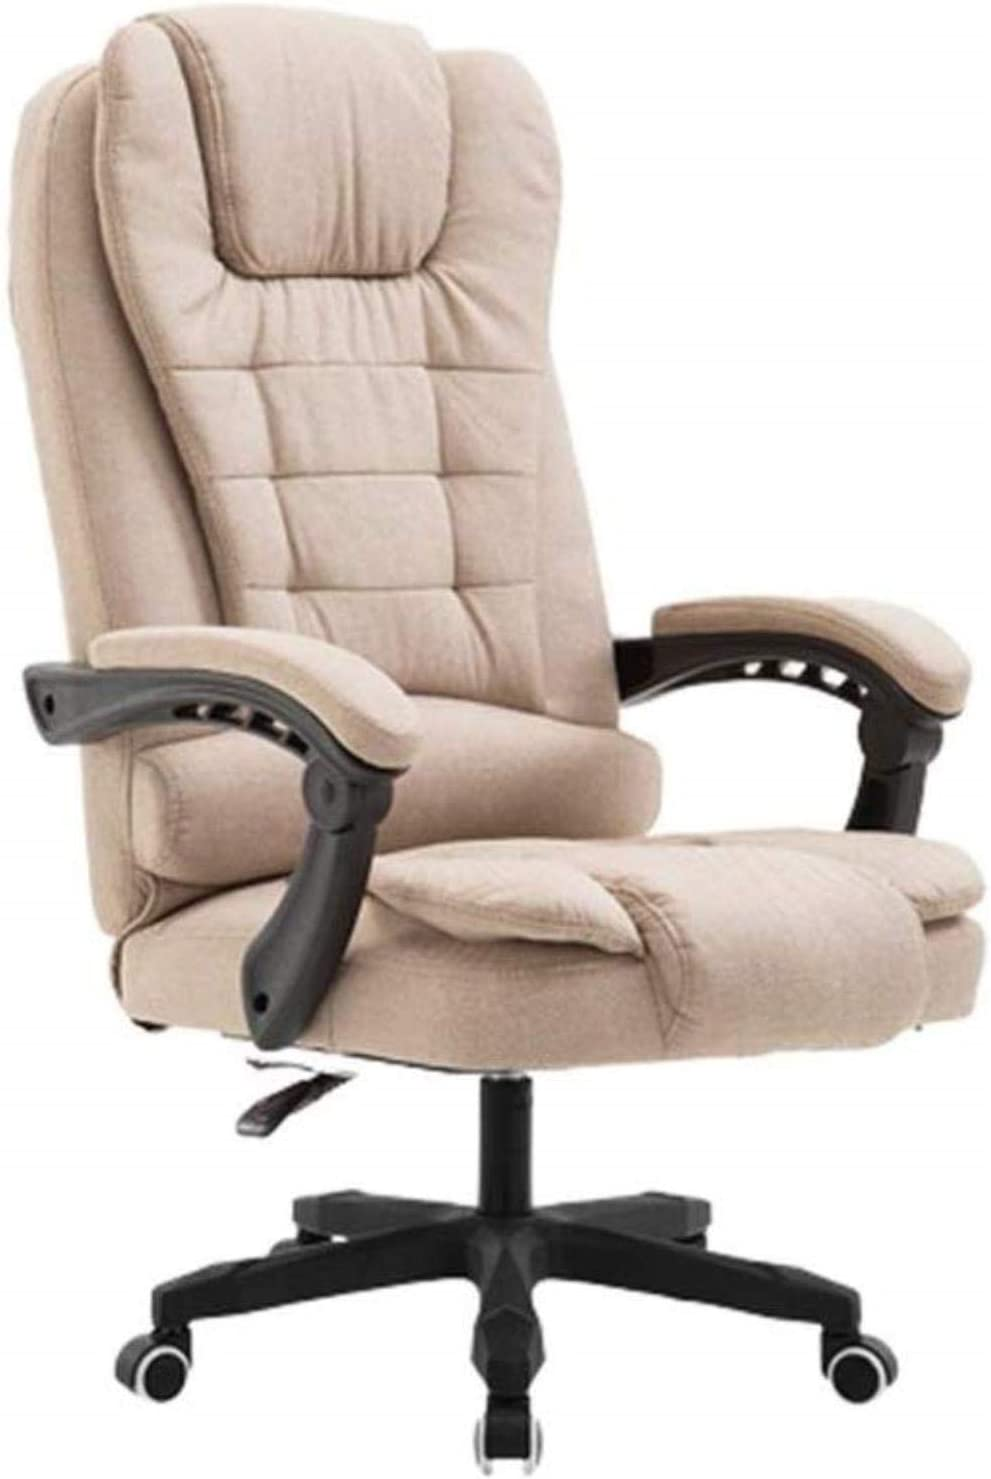 Xiuyun Chaise de bureau Jeu, Haut Retour exécutif Groupe